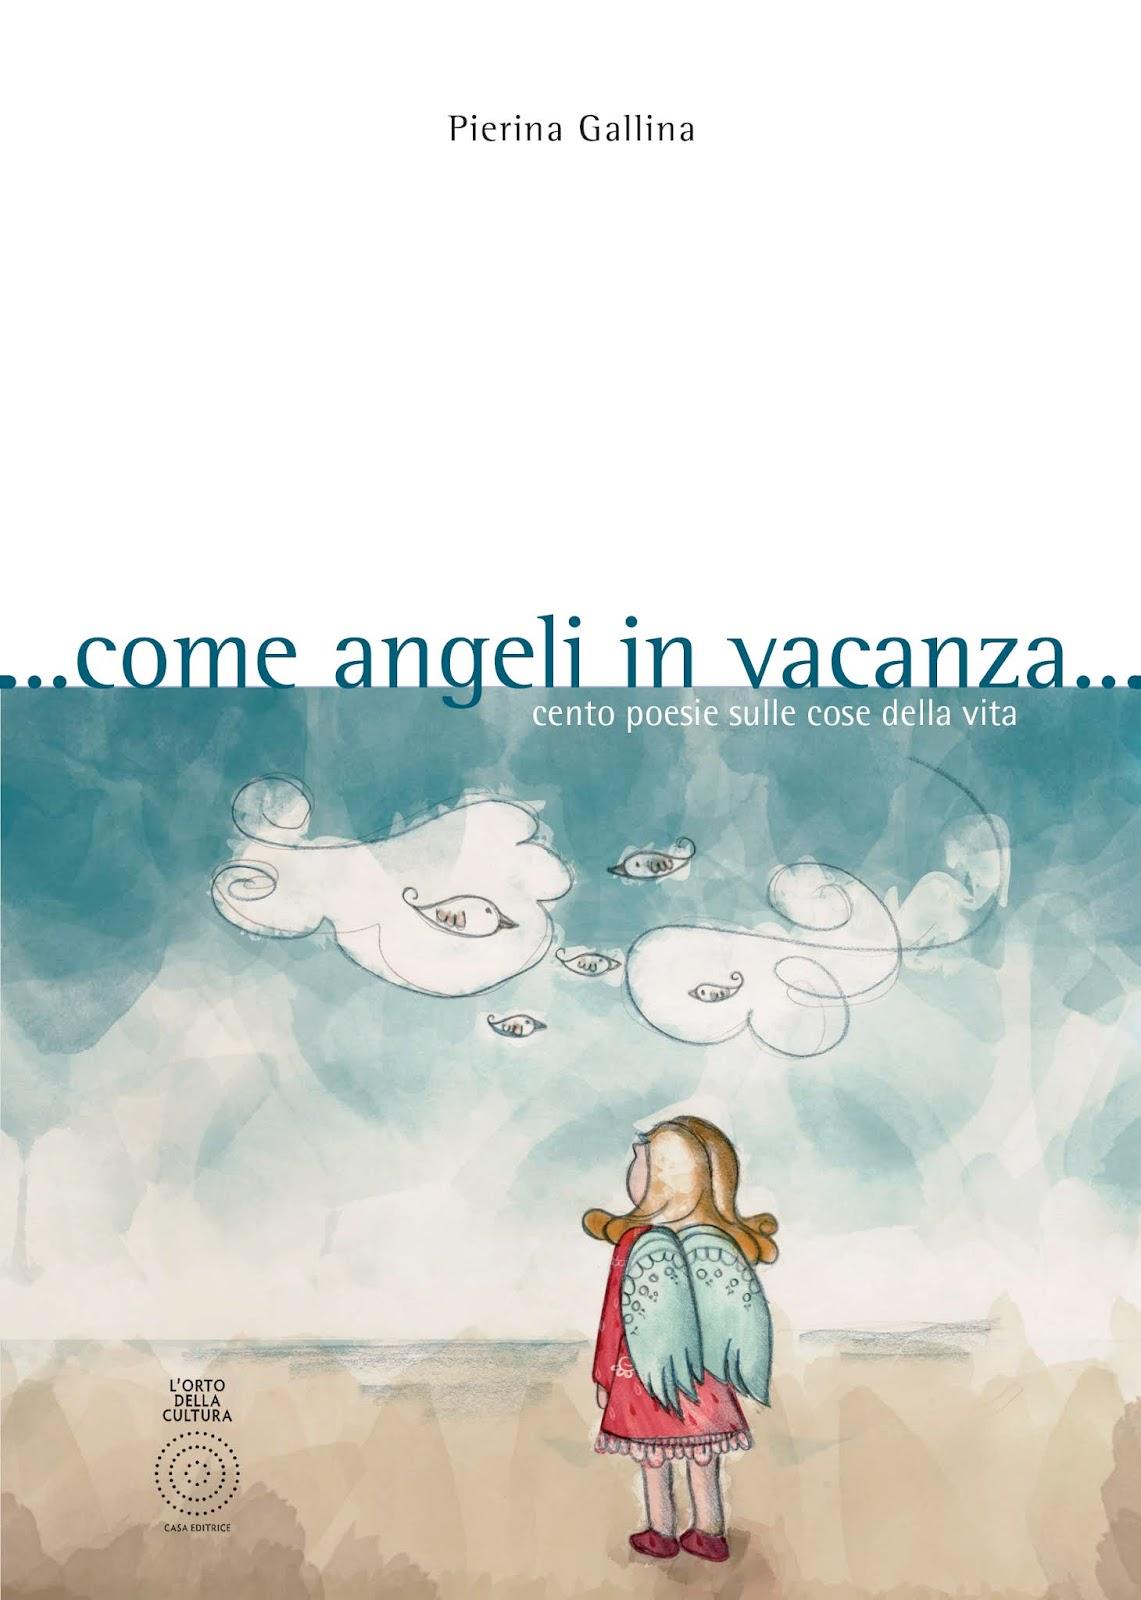 Come angeli in vacanza